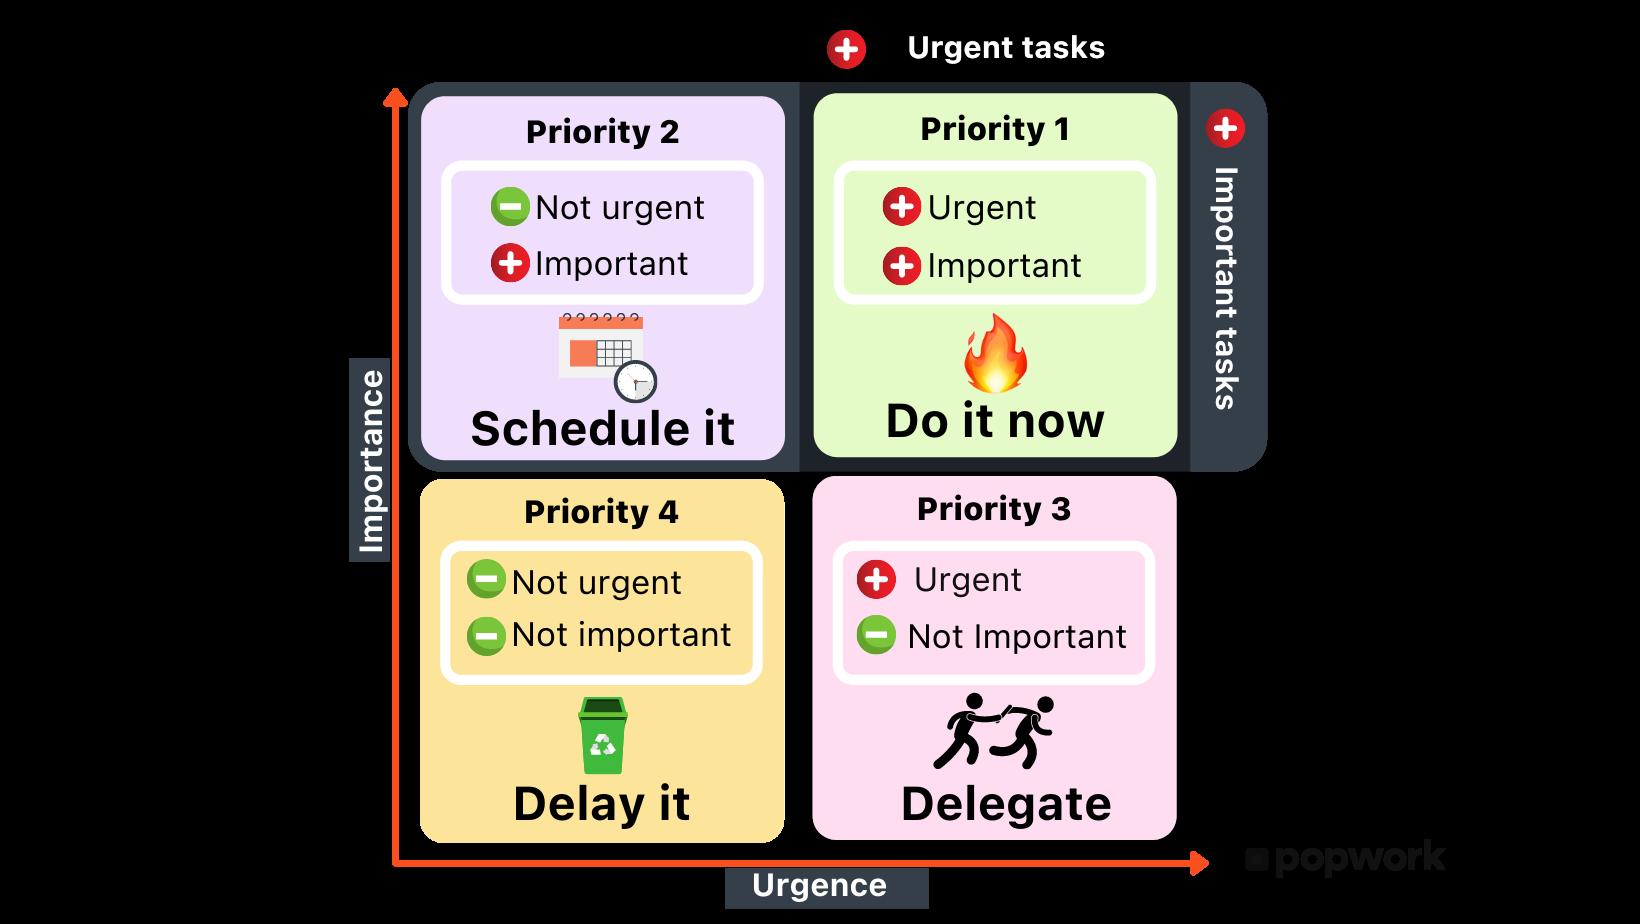 Matrice-Eisenhower- Important & Urgent: Do it now; Not important & urgent : Schedule it; Important & not urgent : Delegate; Not Urgent & Not important : Delay it- Popwork